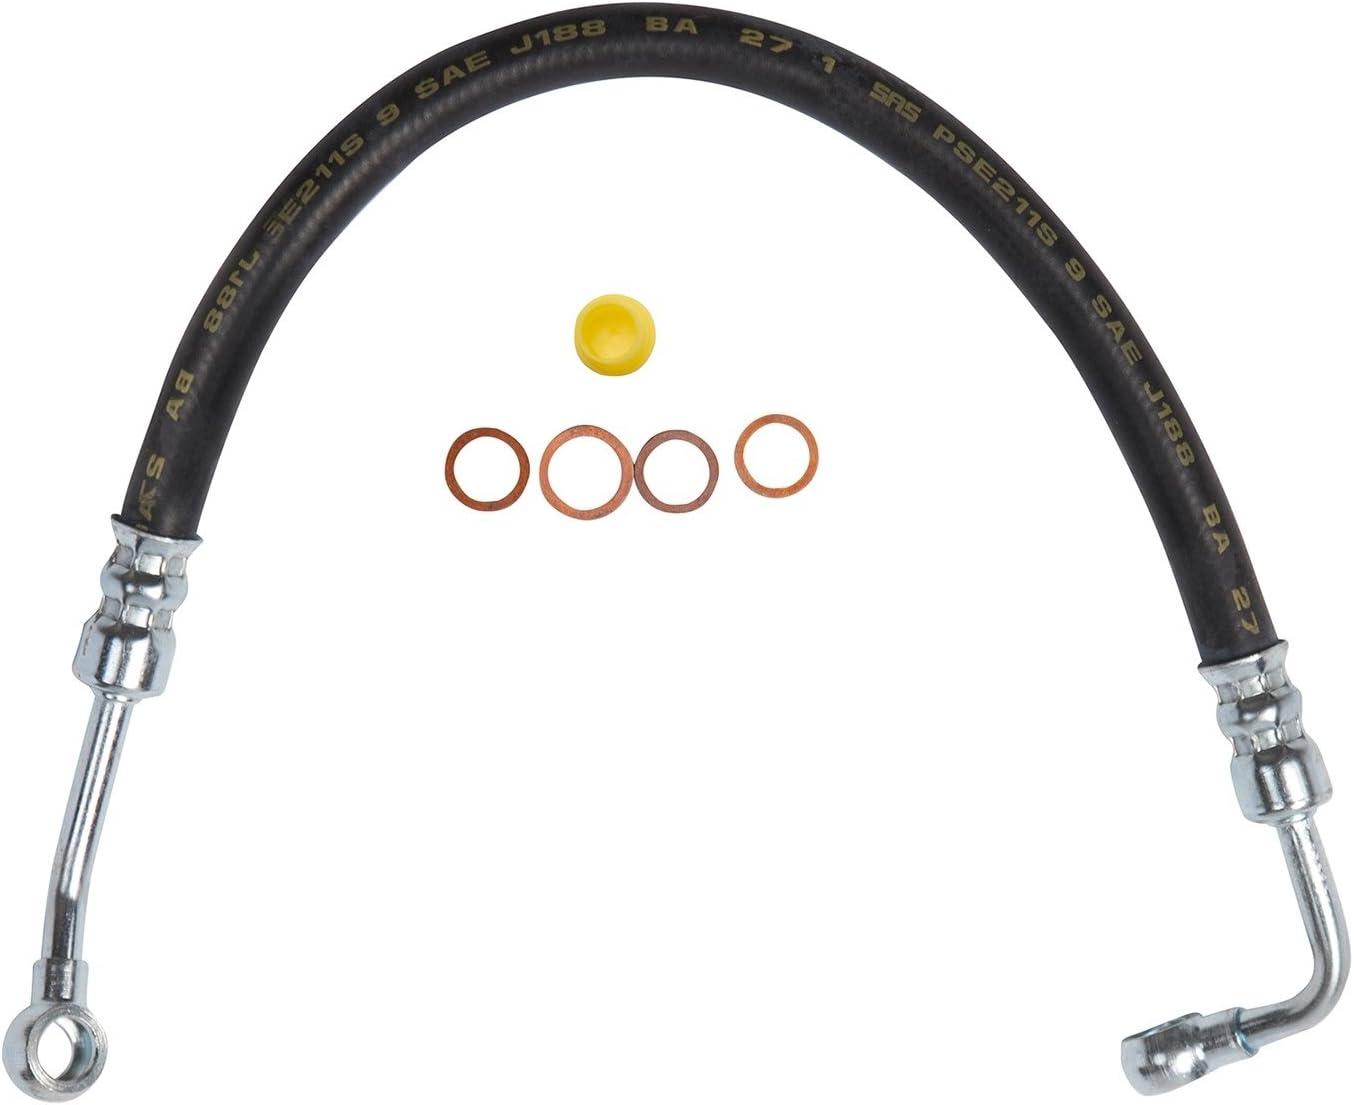 Edelmann 71359 Power Steering Pressure Line Hose Assembly